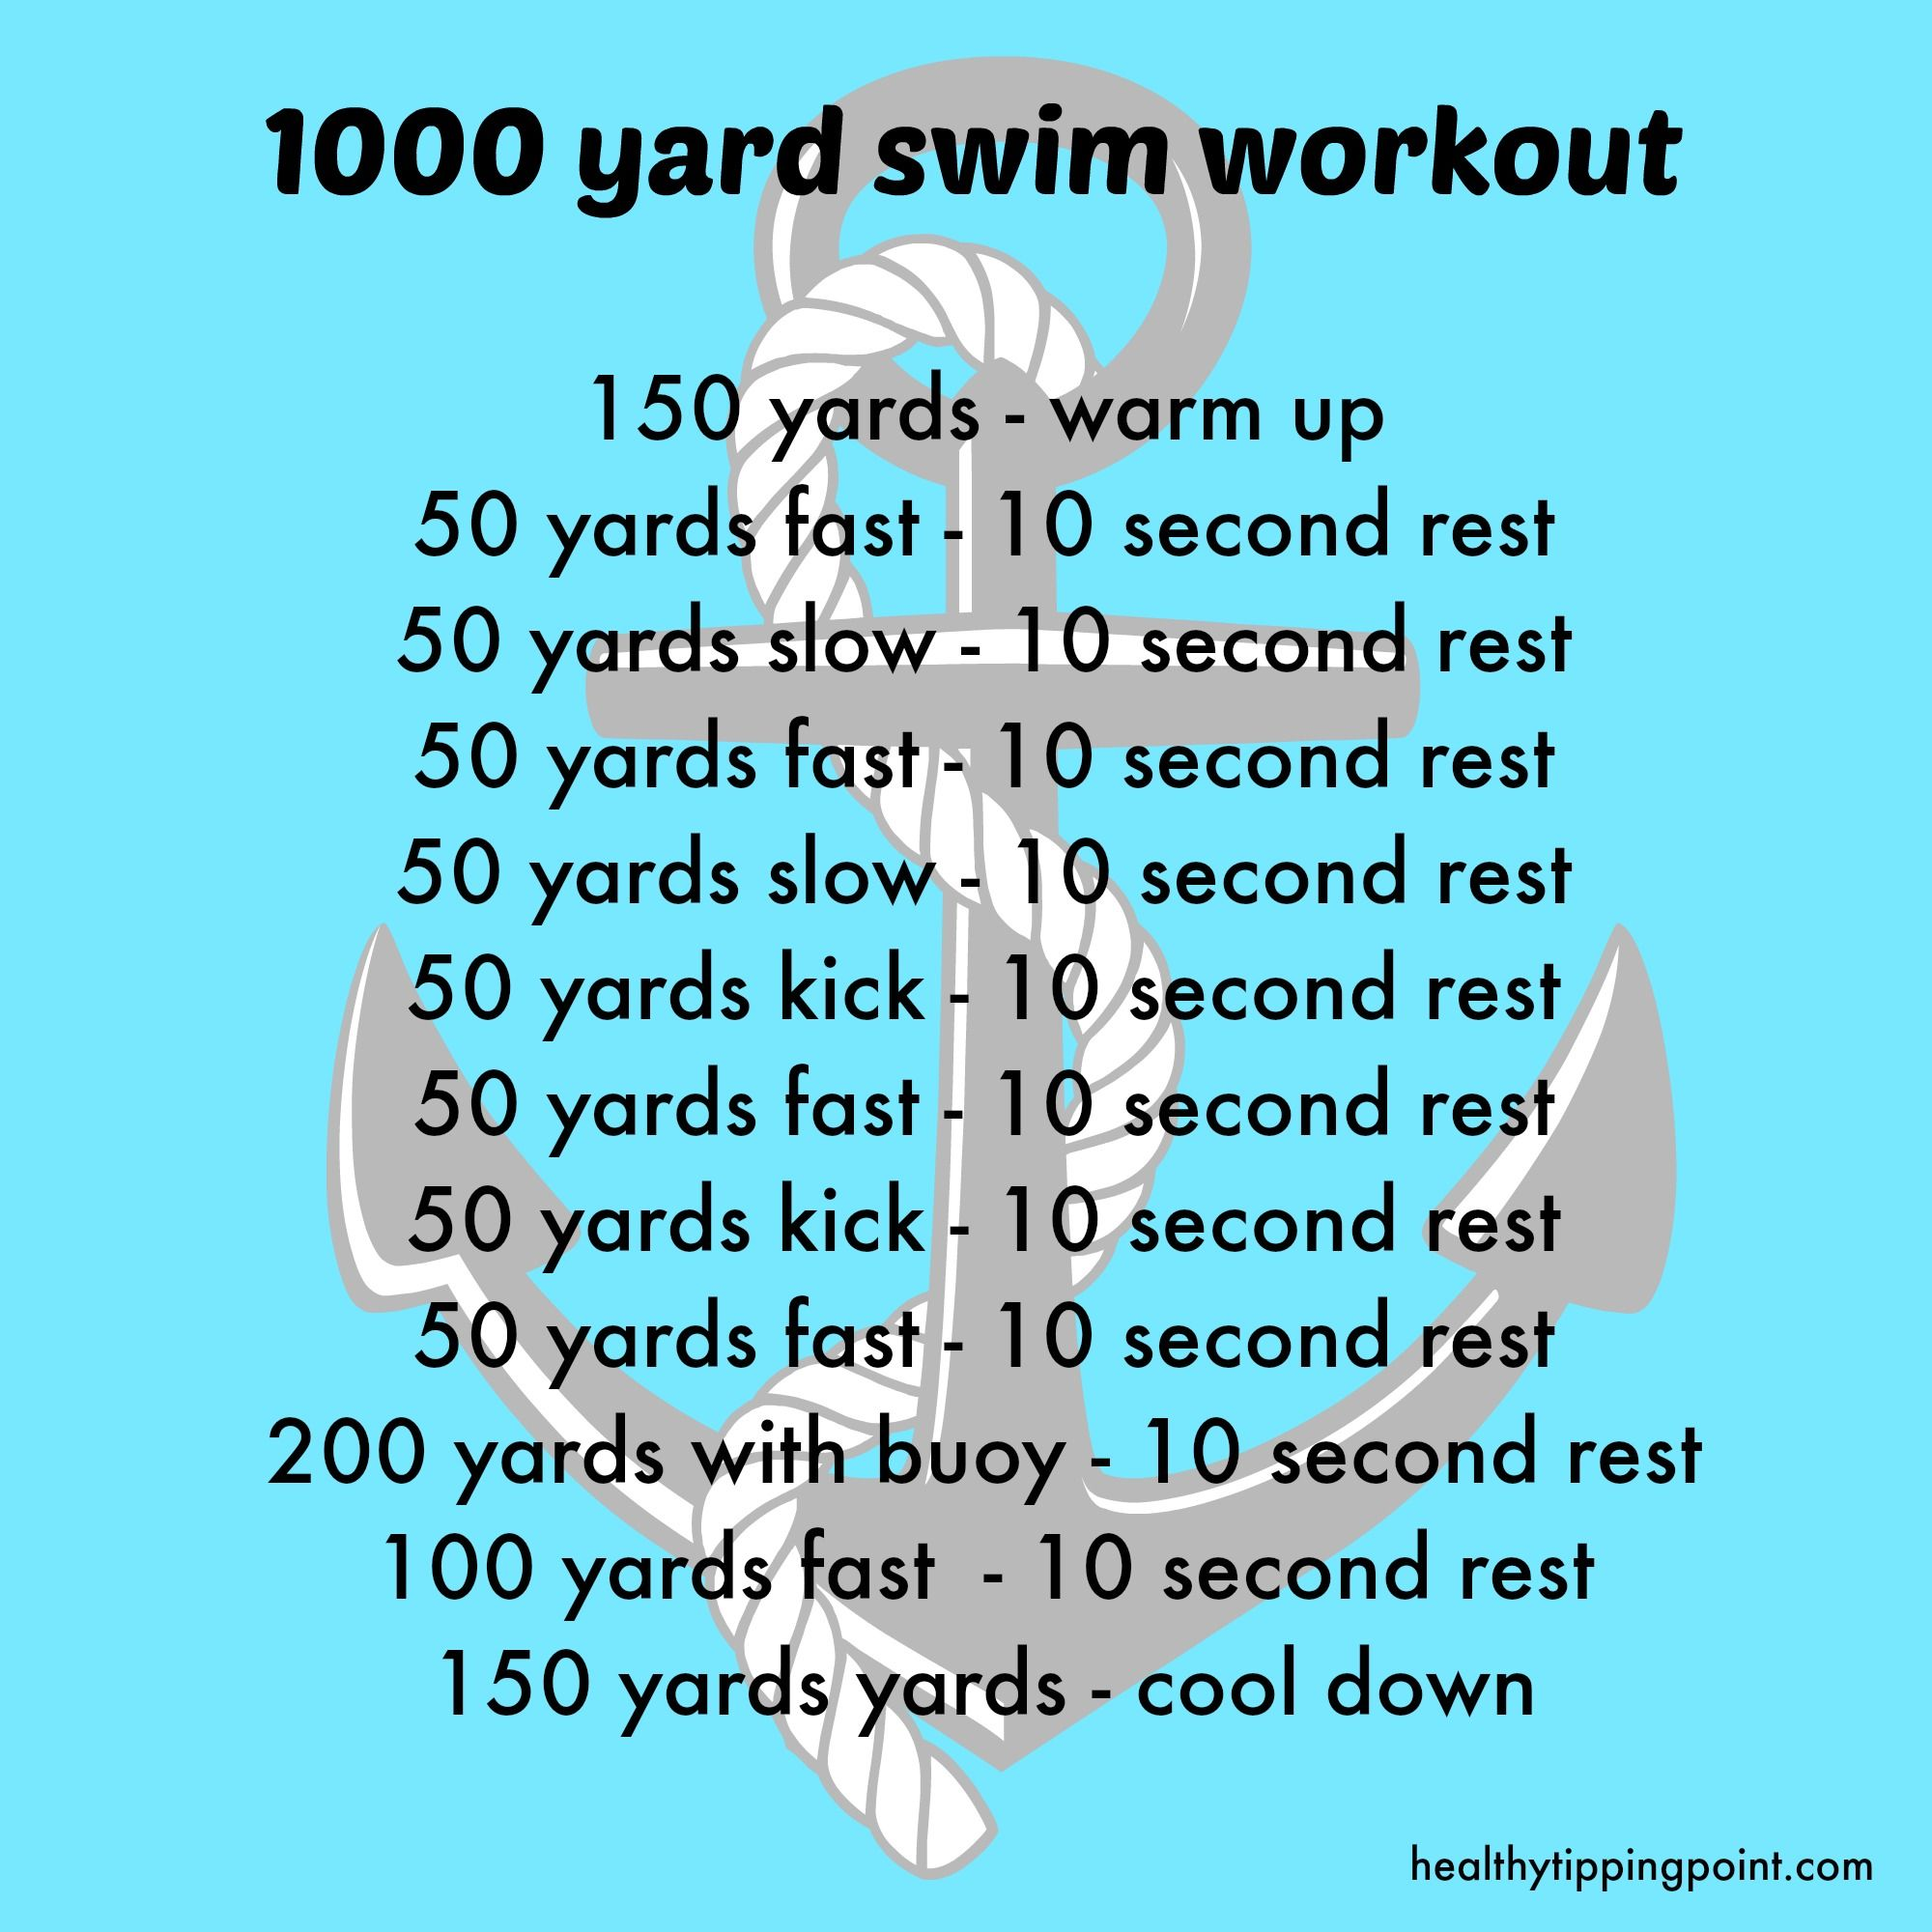 1000 yard swim workout